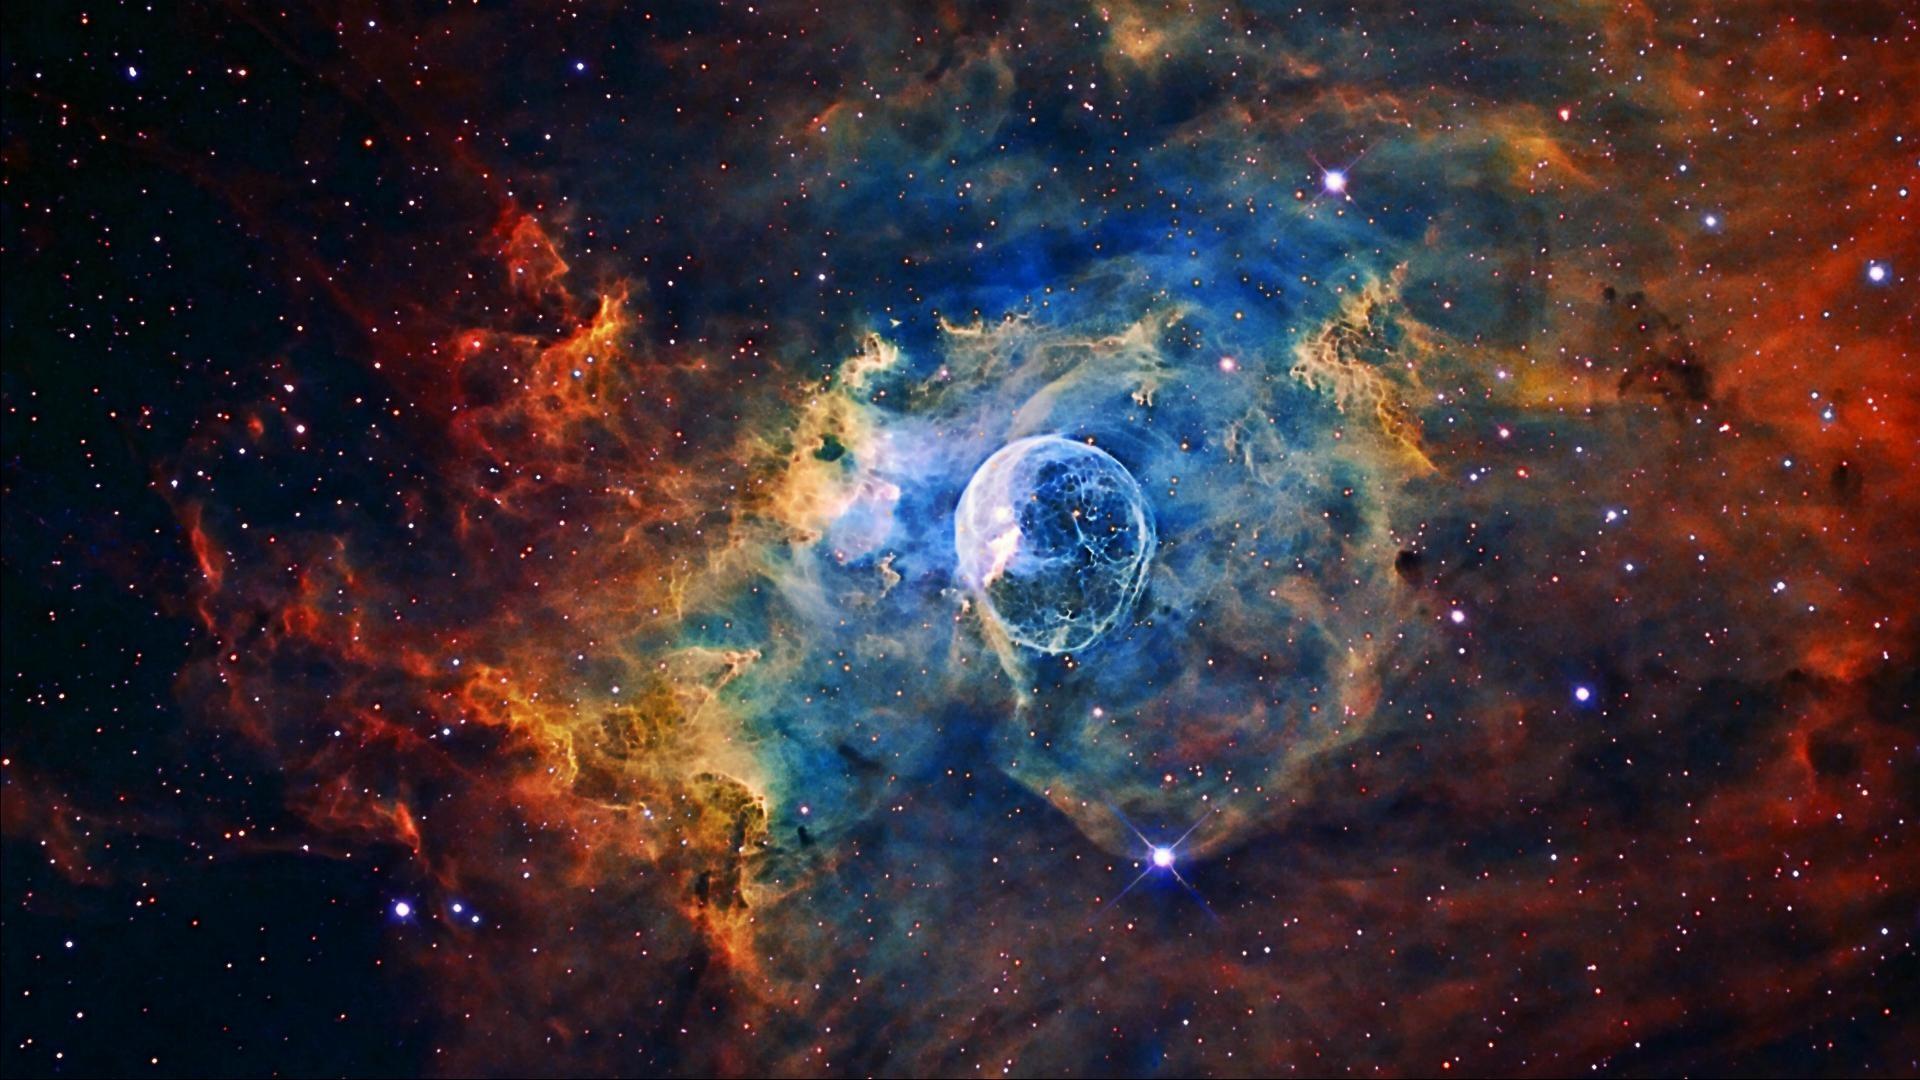 Stellar Bubble Nebula Image for Hubble's 26th Anniversary .